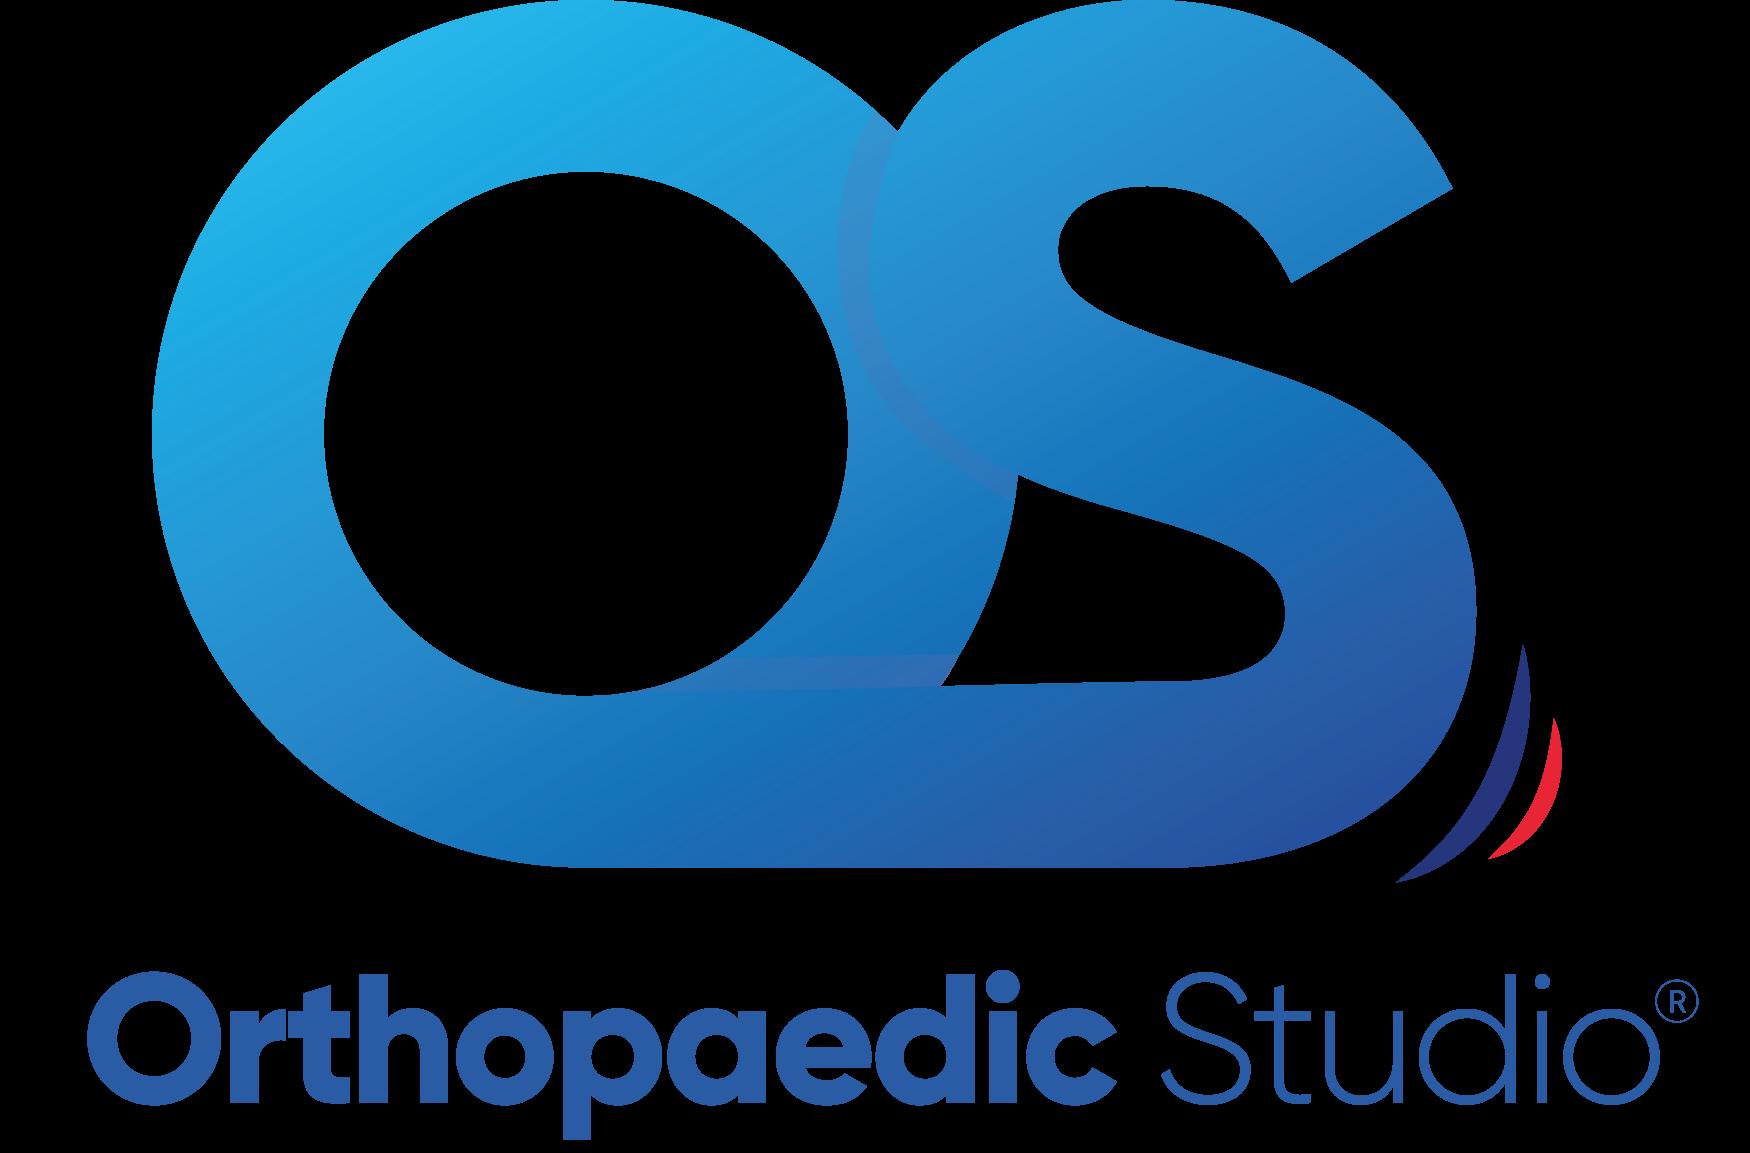 orthopaedic studio